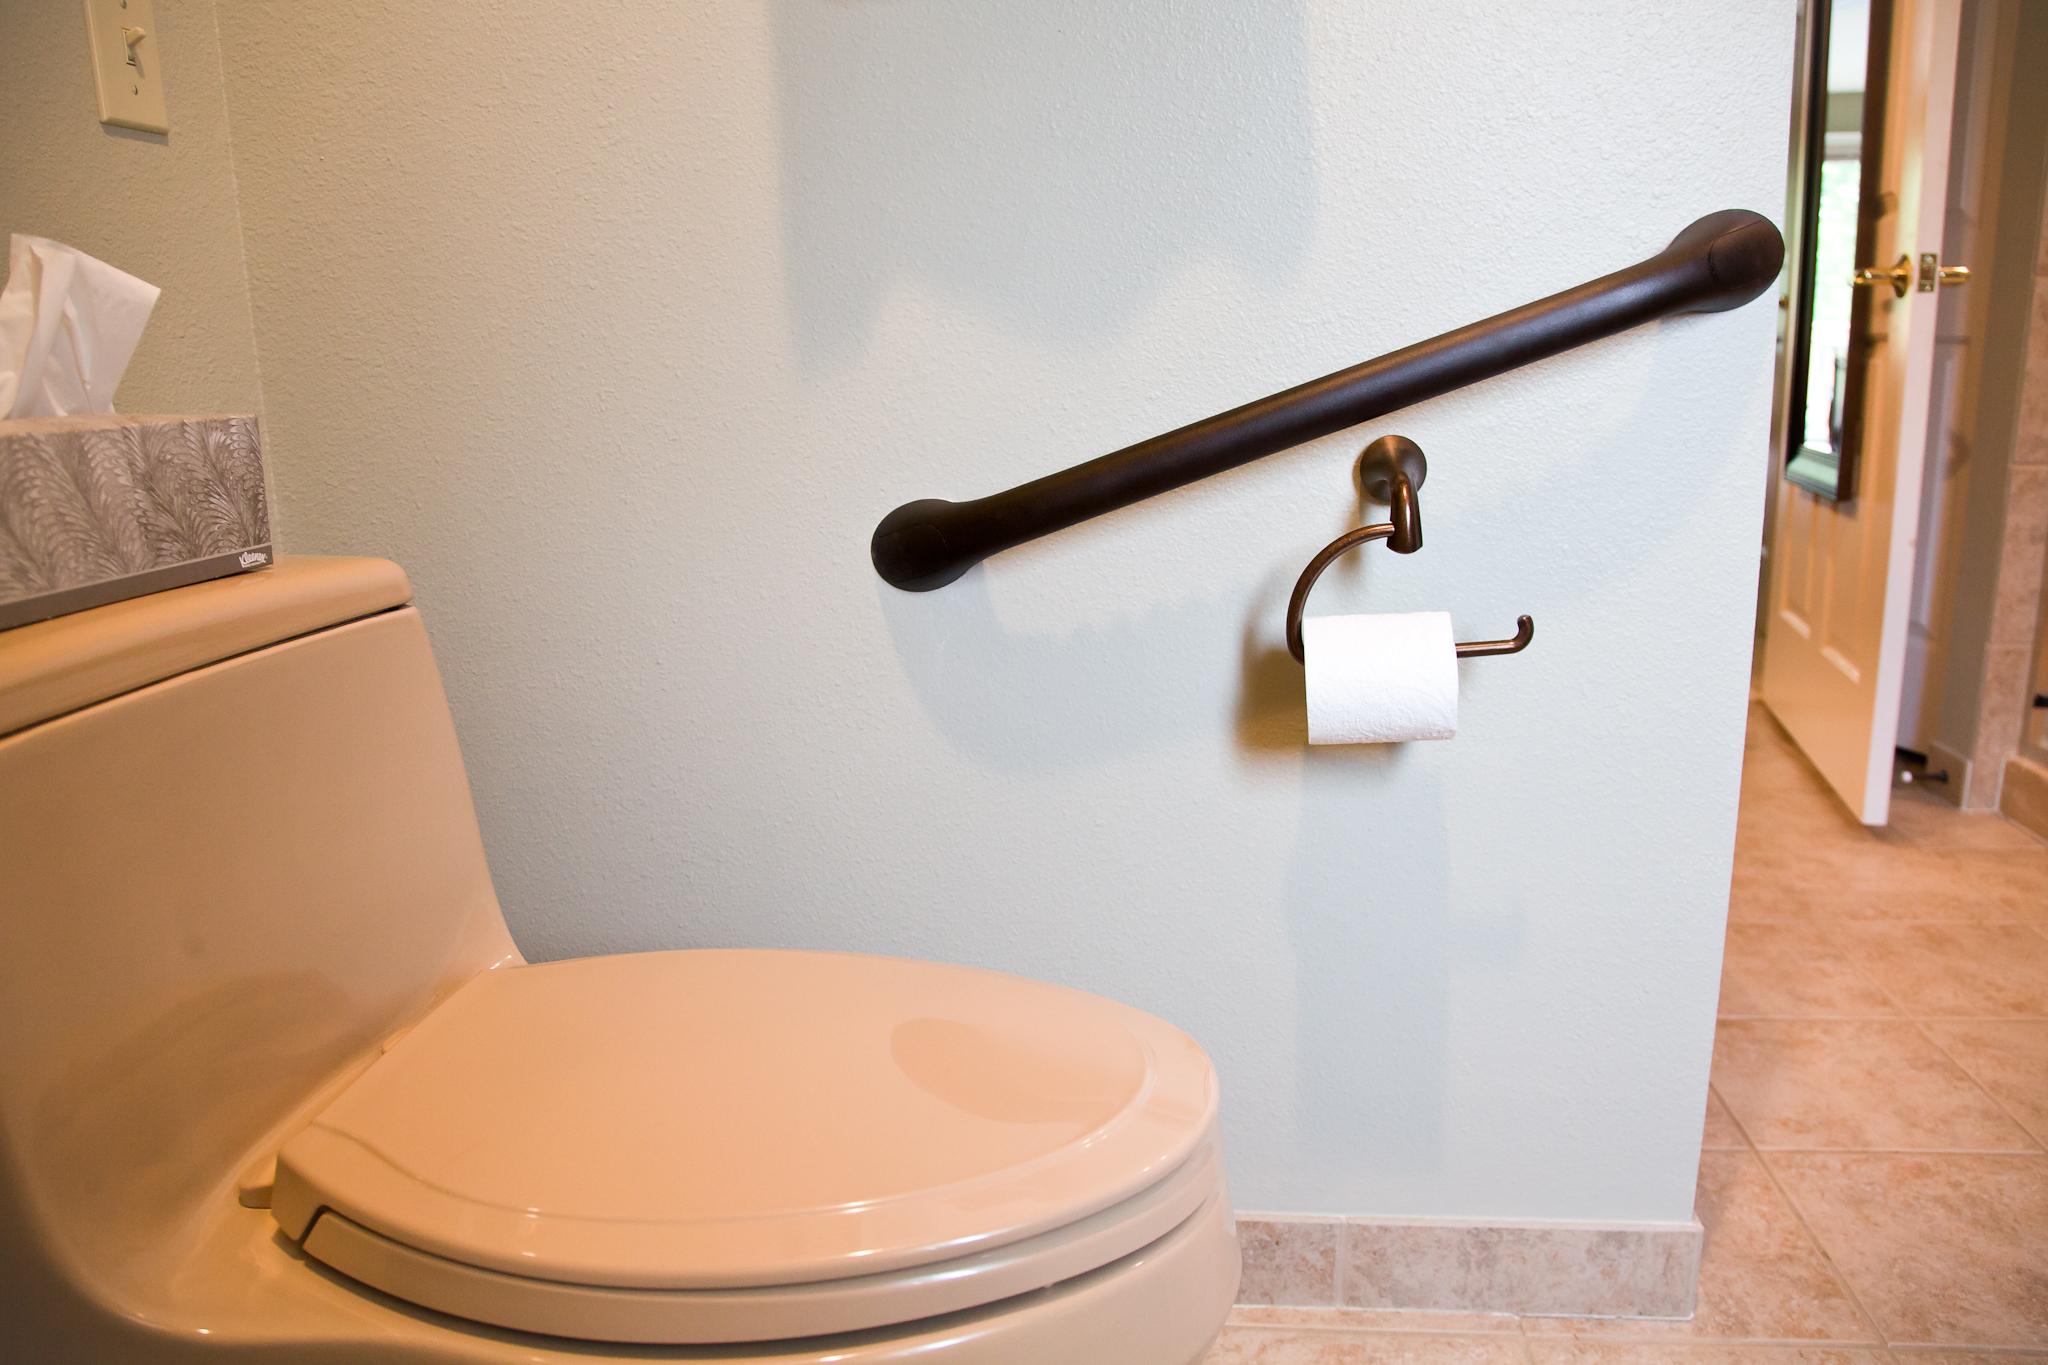 toilet grab bar | grab bar for toilet | smart accessible living